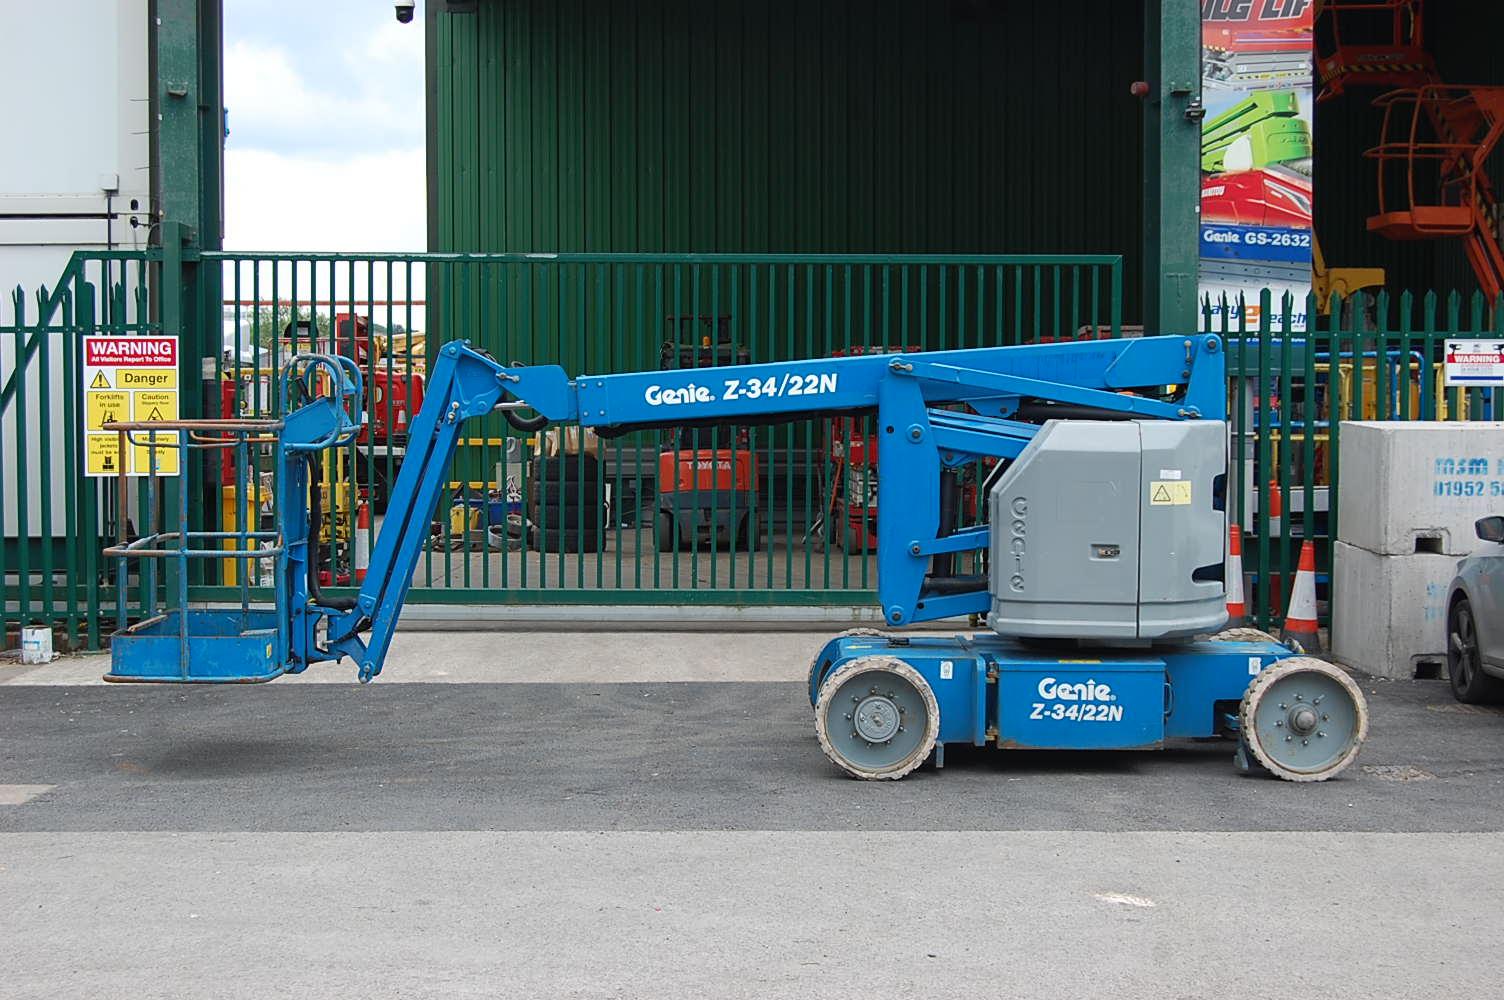 Genie Z34/22N Electric Boom Lift 12.5m